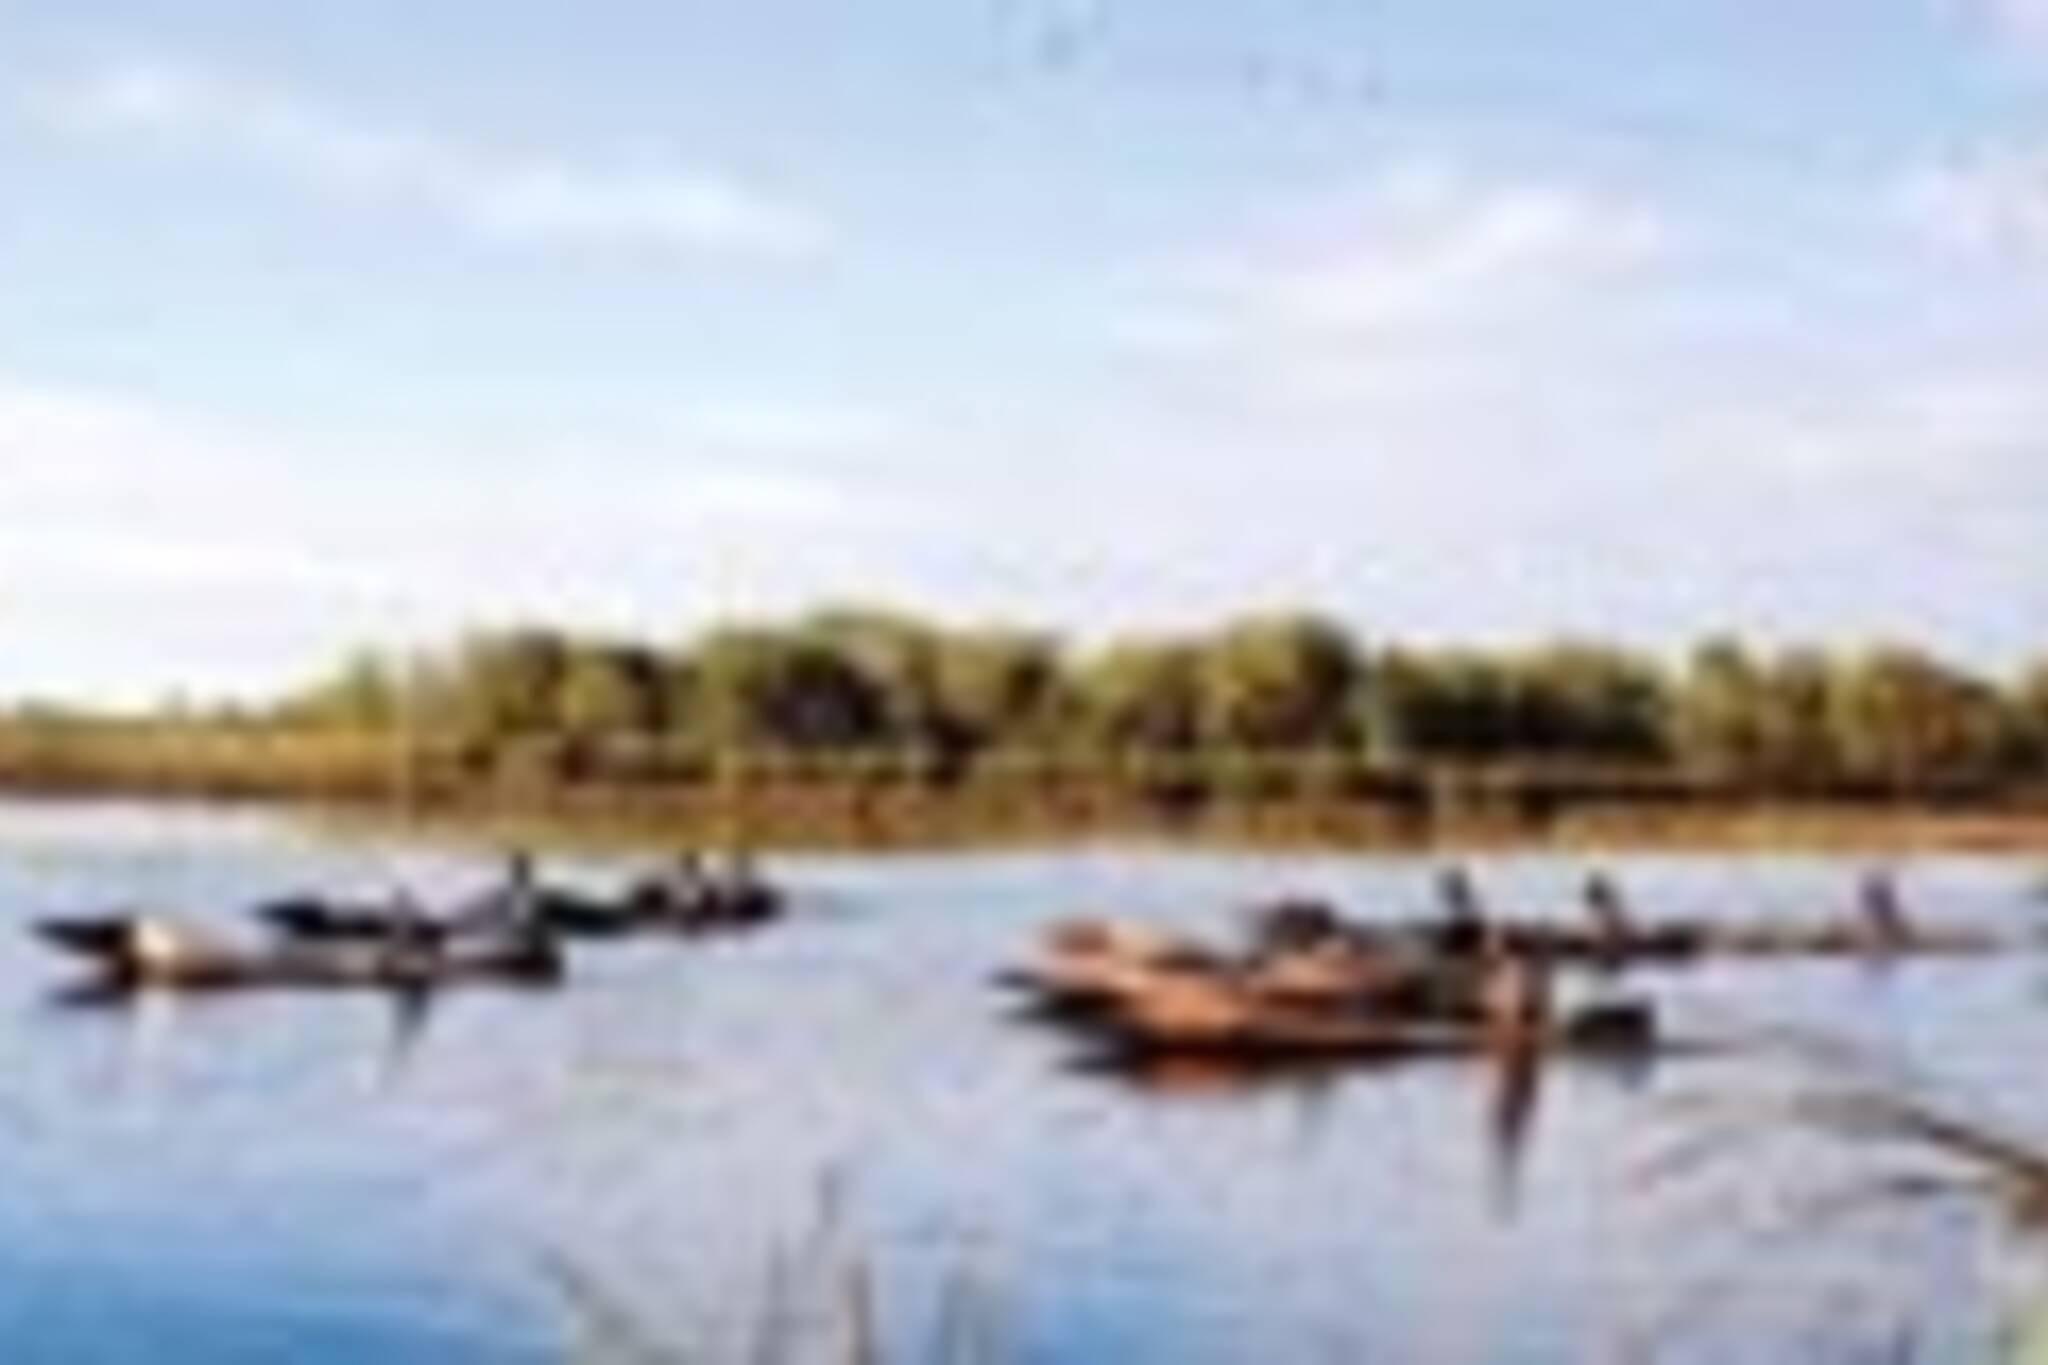 20060911_canoes.jpg